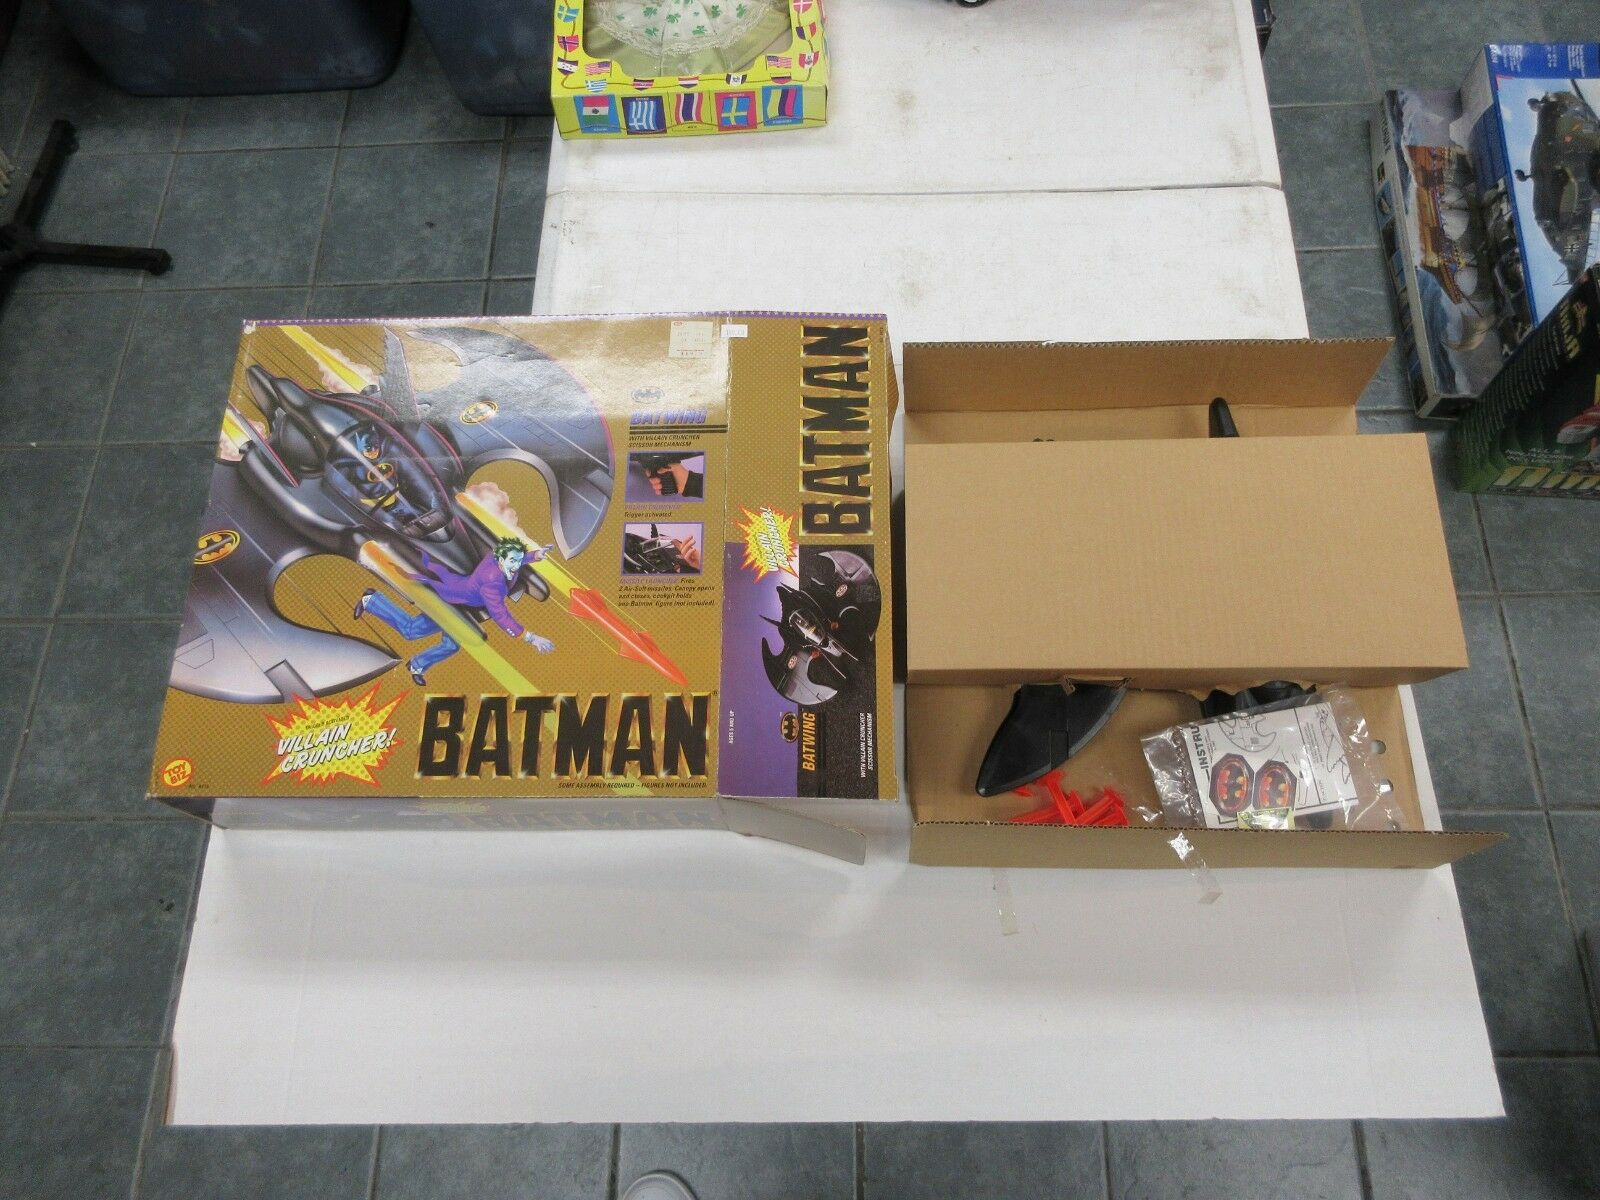 1989 TOY BIZ DC COMICS BATMAN FIGURE BATWING VEHICLE W  BOX